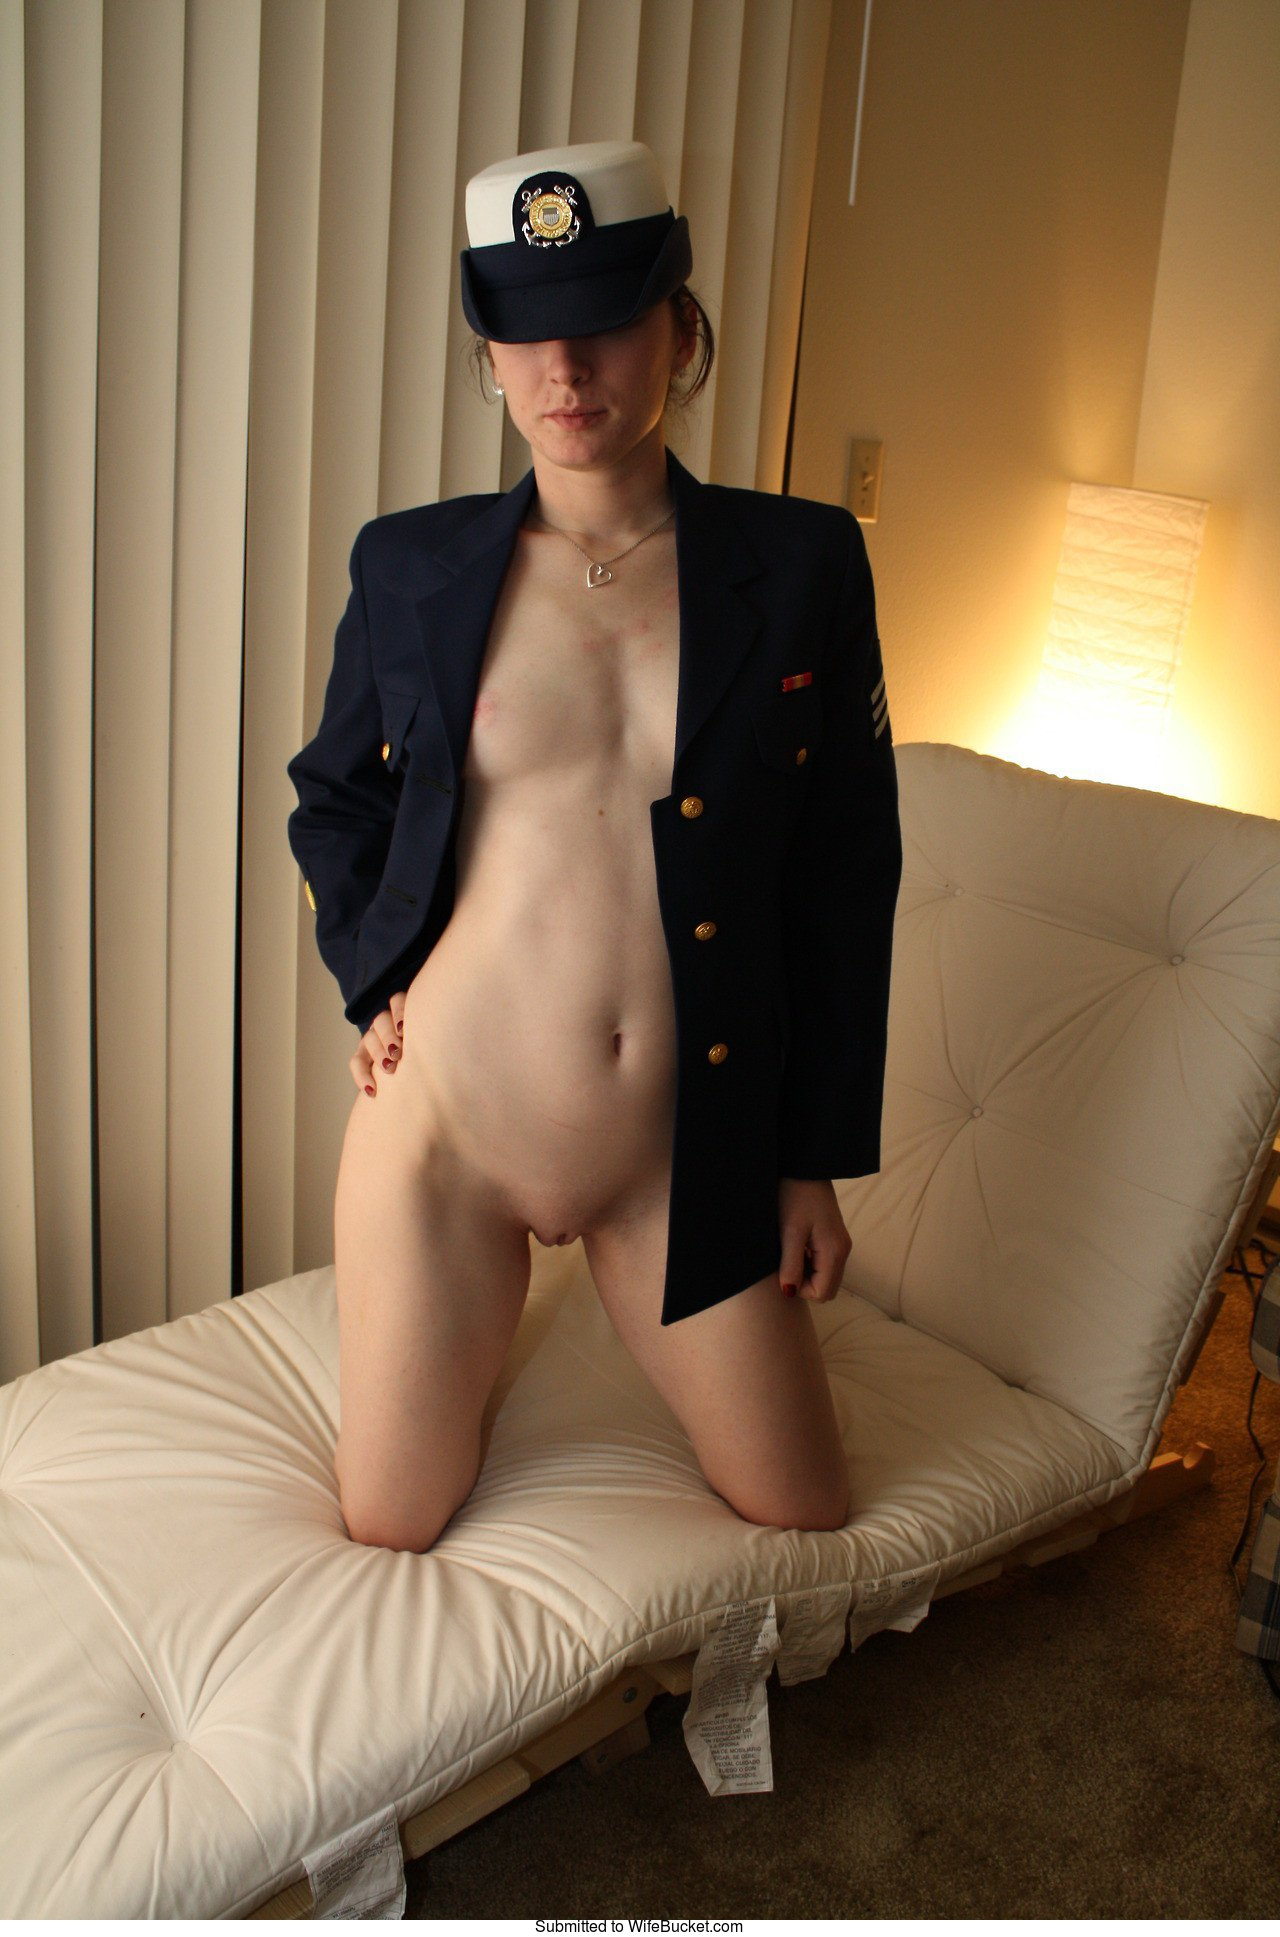 Wifebucket  Naked Army Women - Dangerous But Very Hot-6556